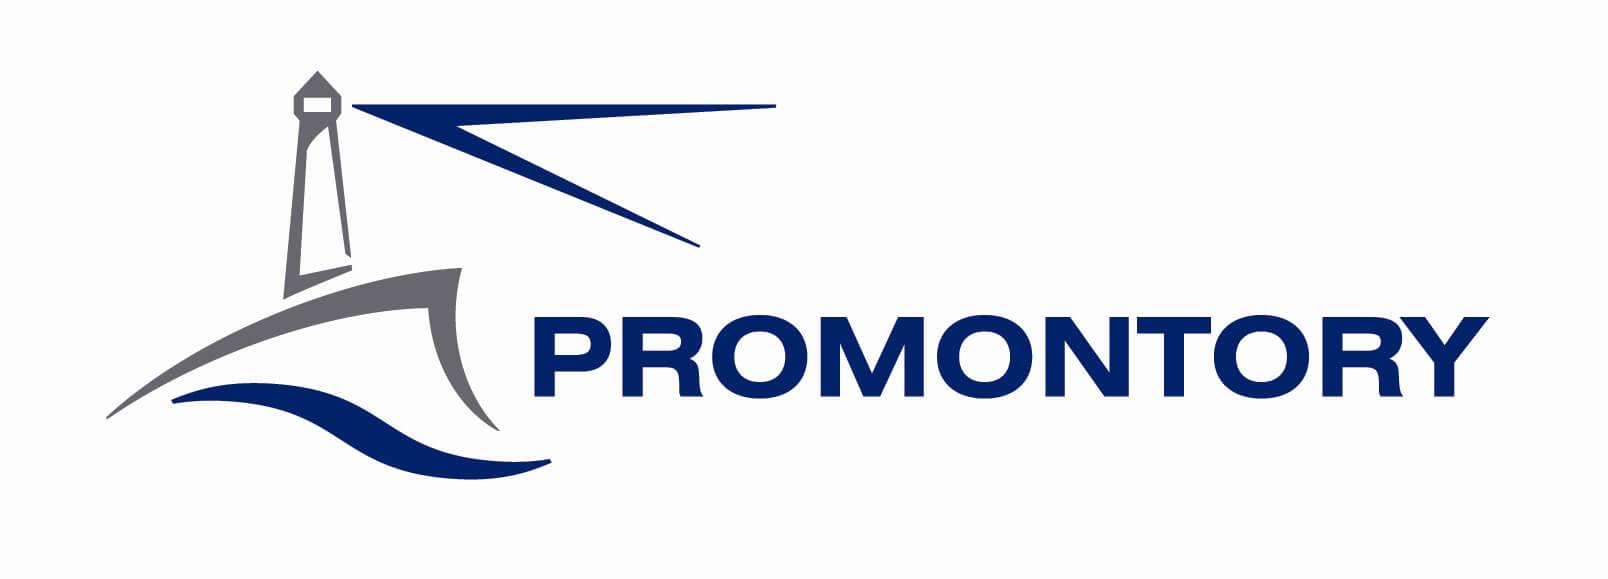 Promontory logo